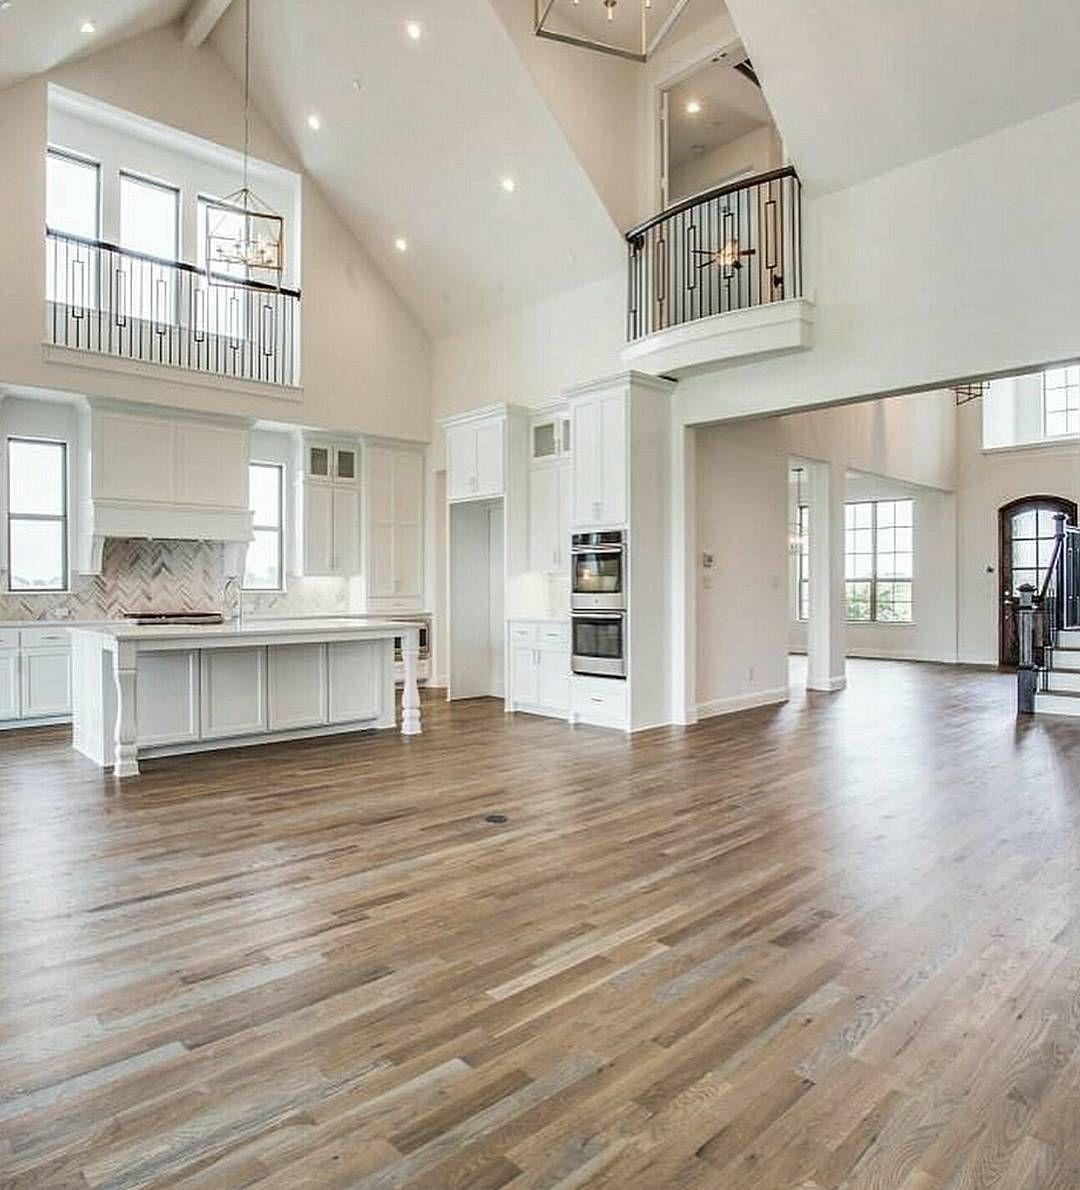 6 401 Otmetok Nravitsya 45 Kommentariev Grace R Lovefordesigns V Instagram Love This Dream House Ideas Kitchens Dream House Rooms Dream House Interior